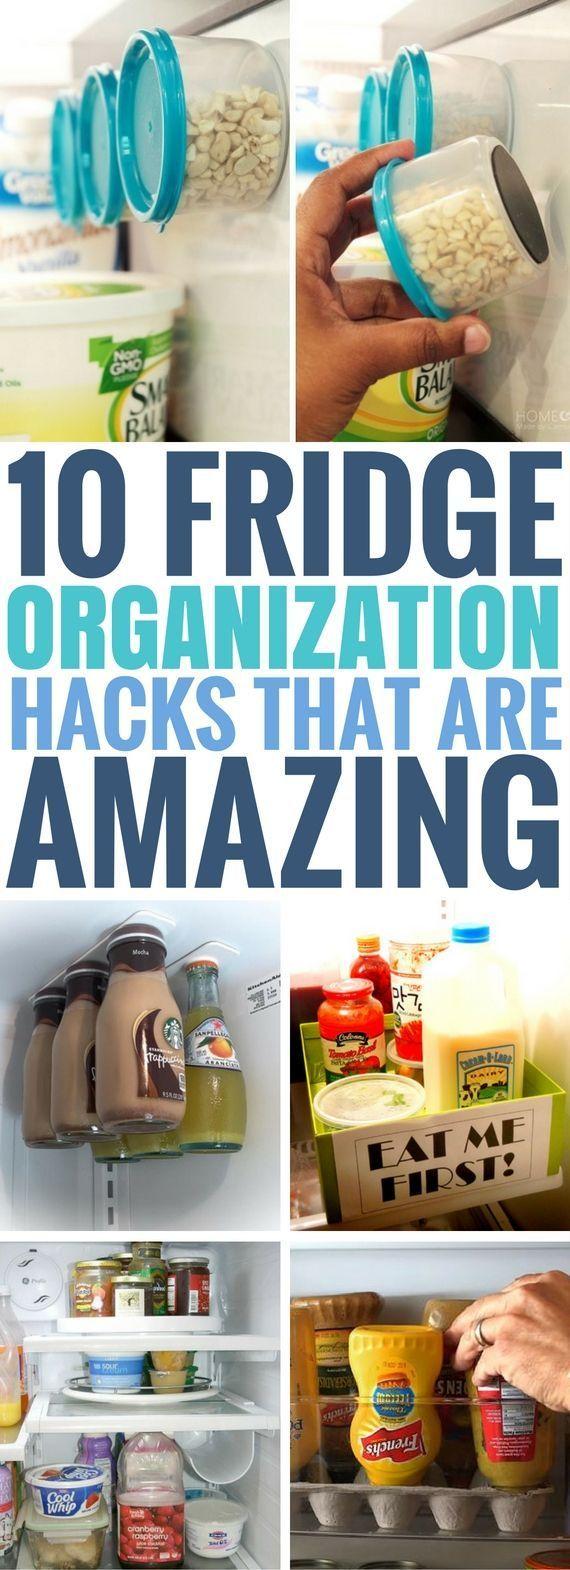 342 best Kitchen Hacks images on Pinterest | Coffee bar station ...